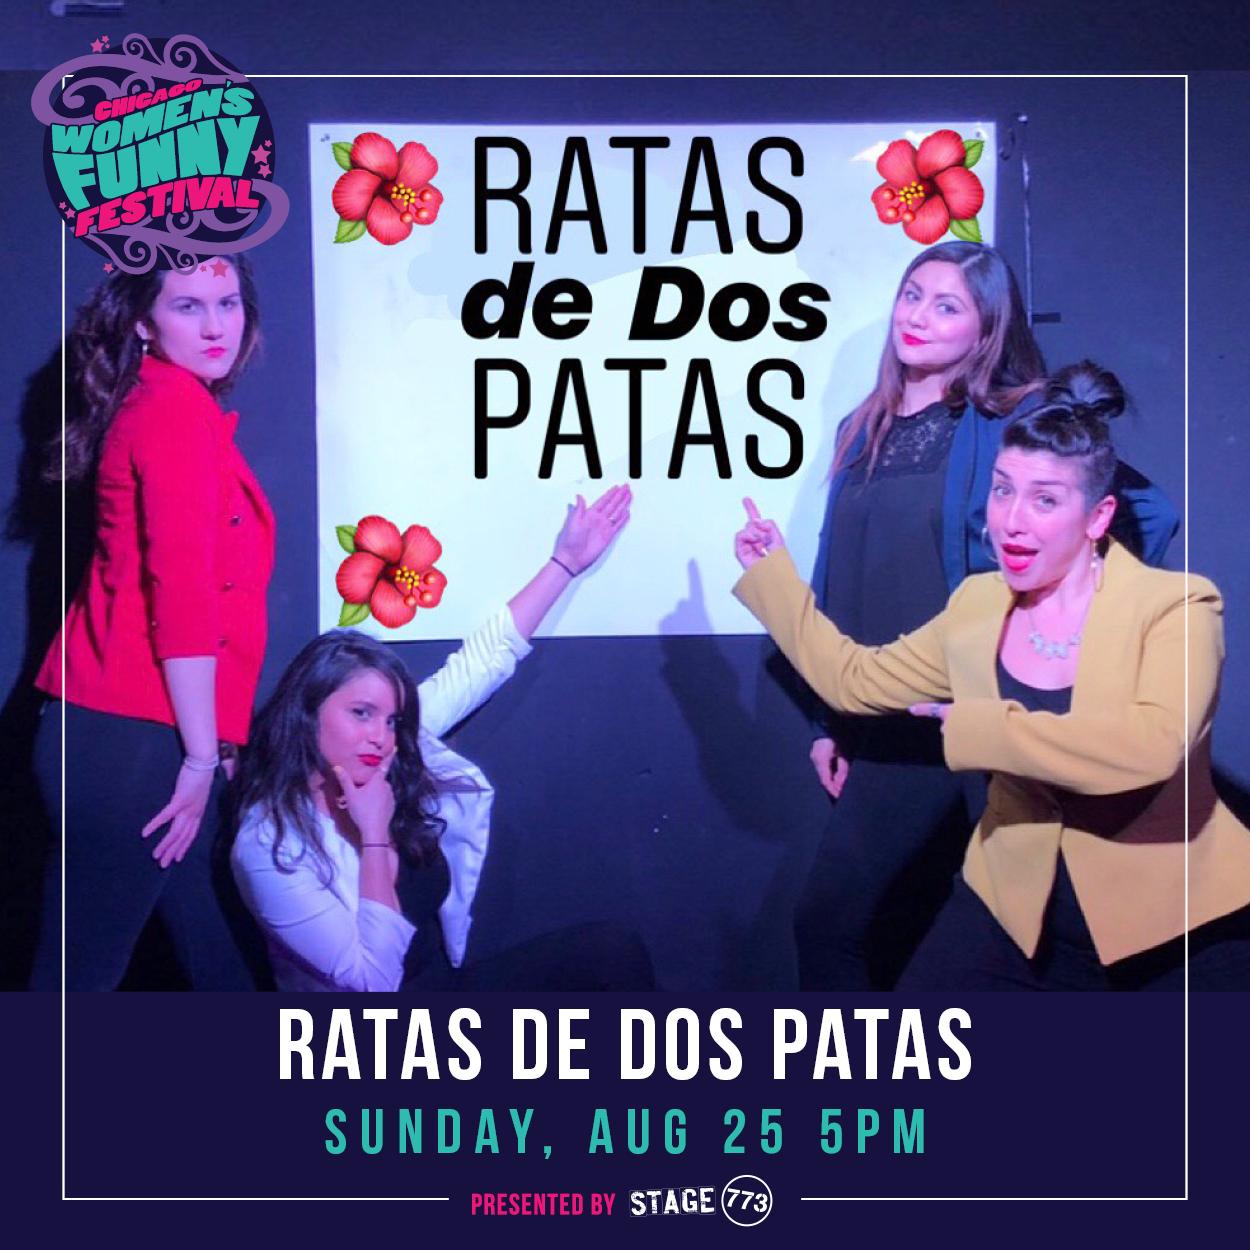 RatasDeDosPatas_Sunday_5PM_CWFF20195.jpg